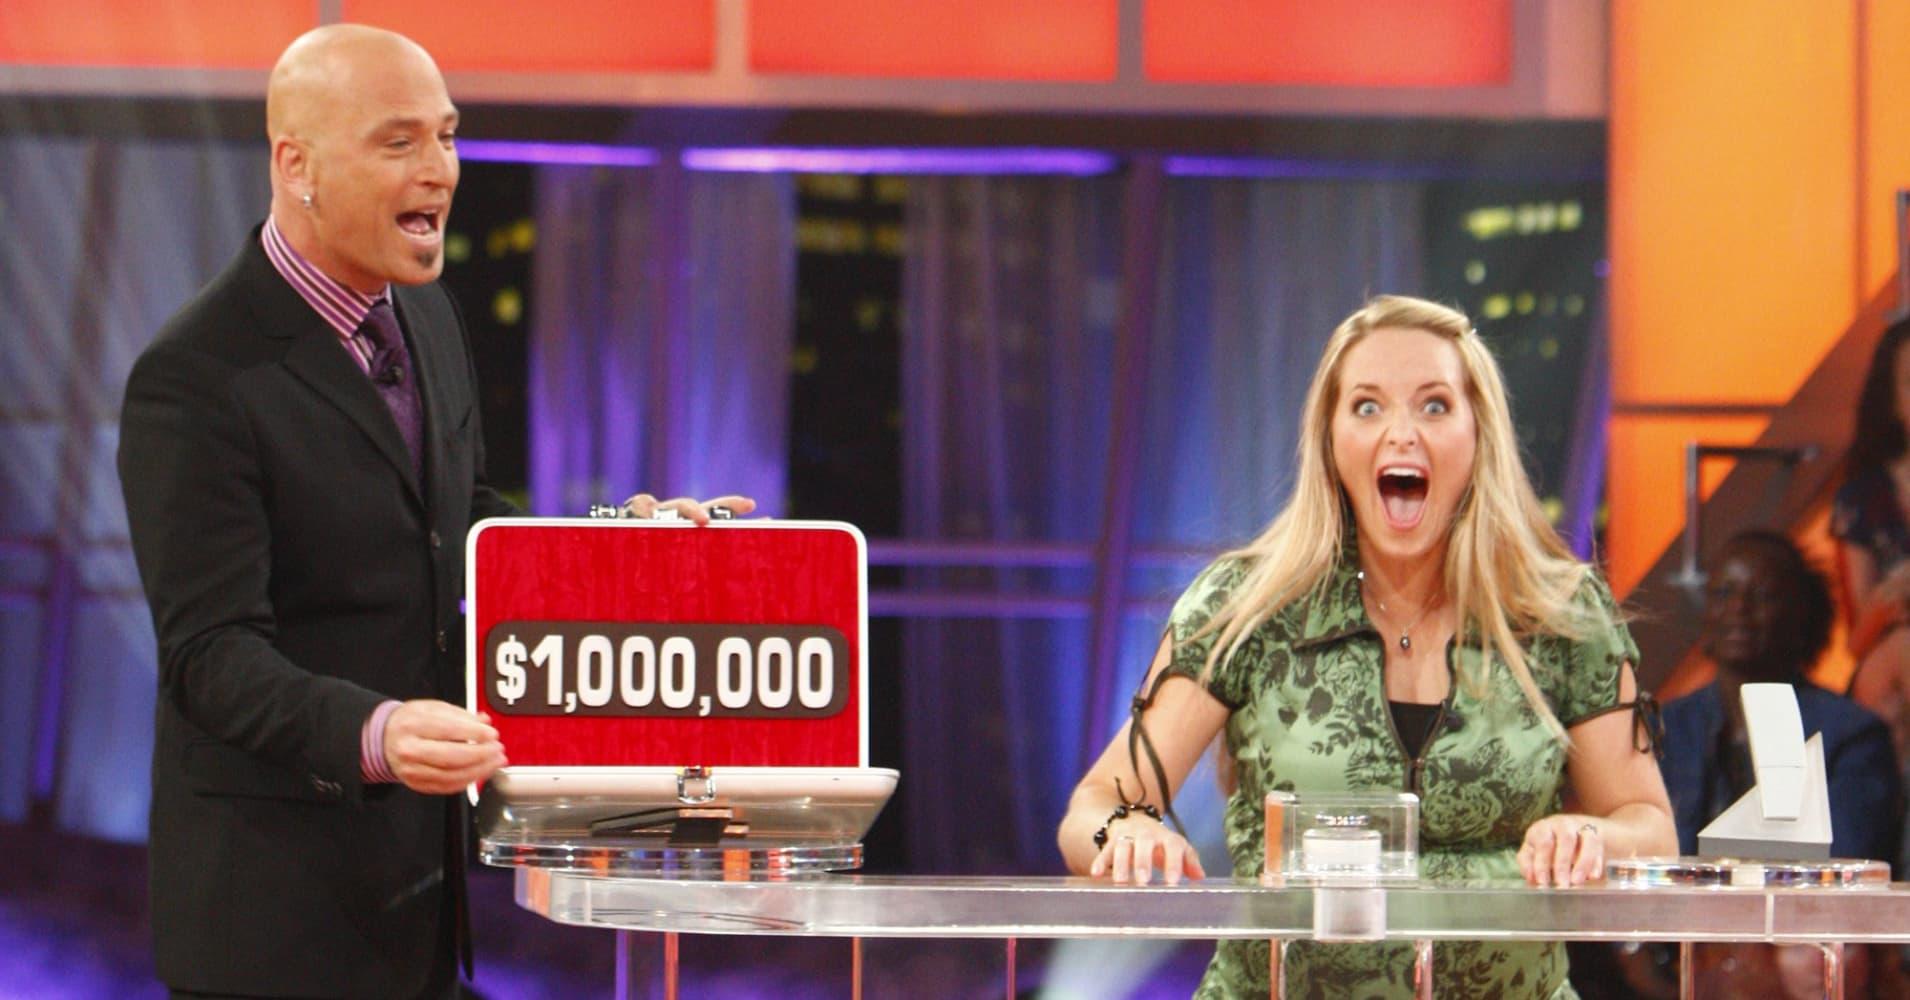 Host Howie Mandel, Million Dollar Winner Jessica Robinson